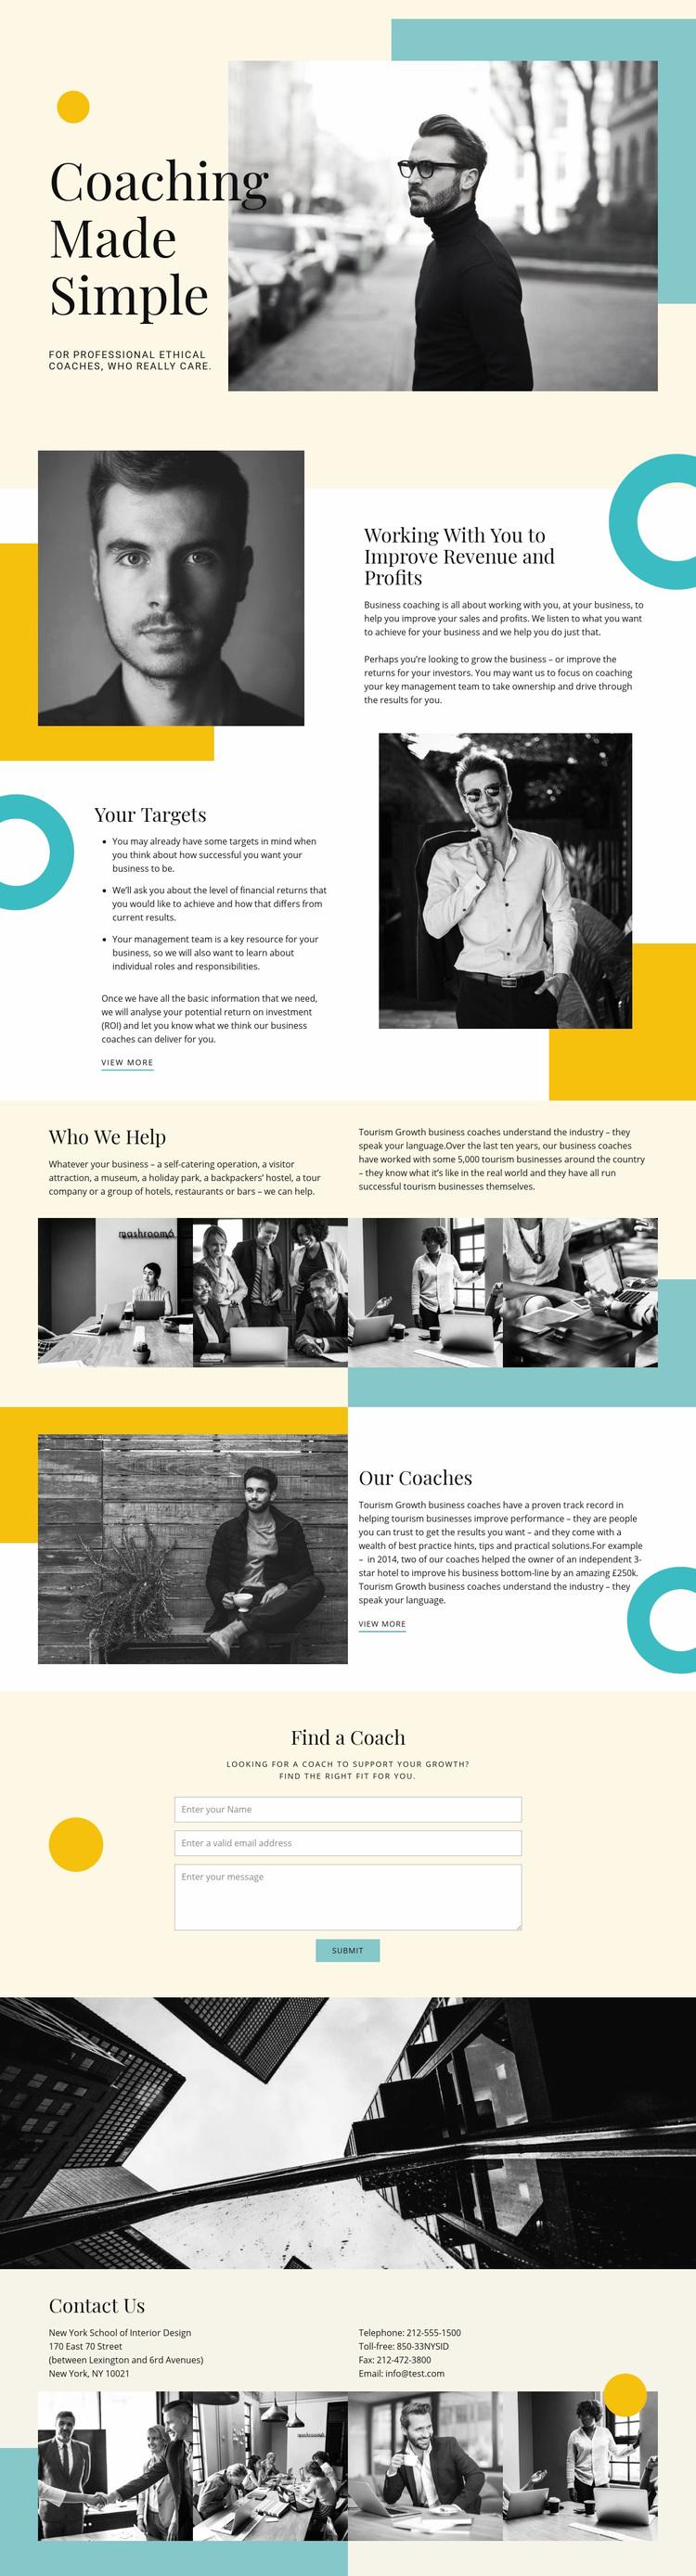 Coaching Company Web Page Designer